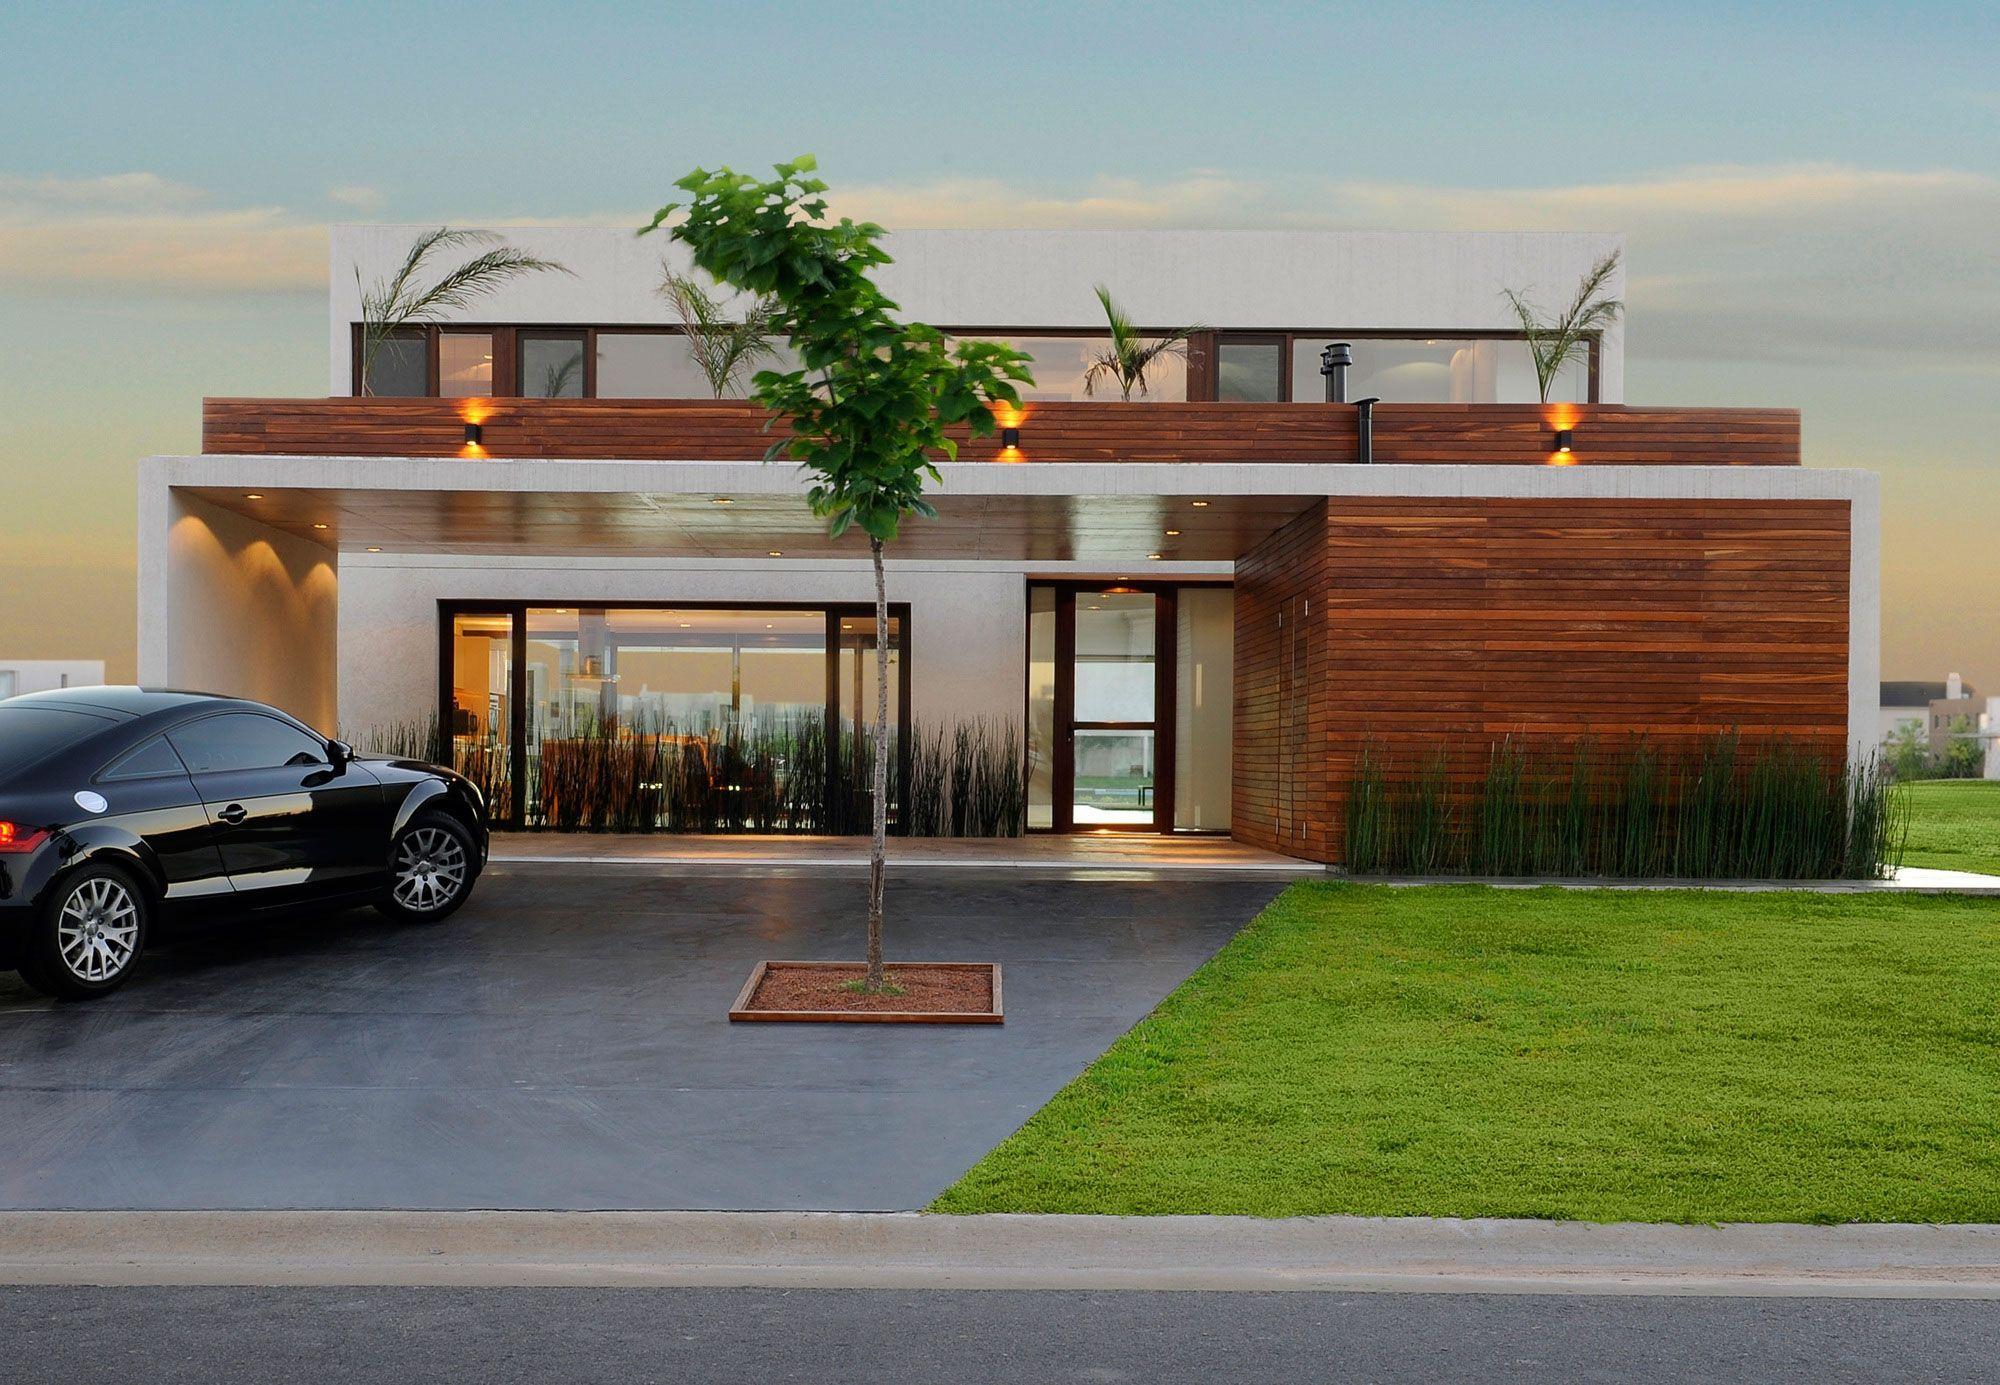 Architecture wonderful modern lake house design large yard green